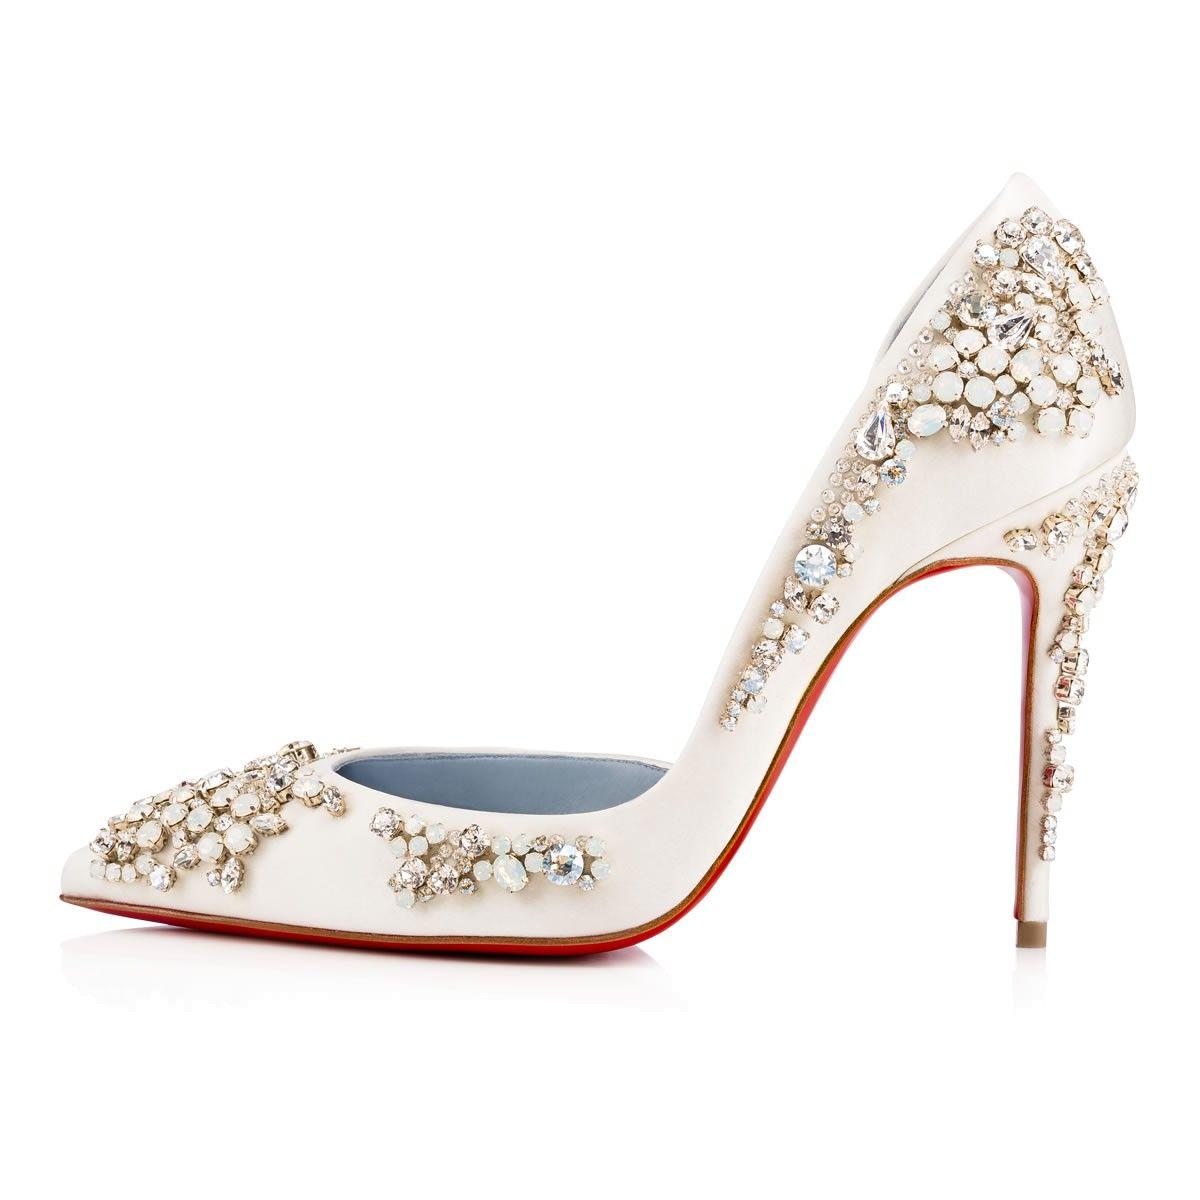 0850301e185d Shoes - Brodiriza - Christian Louboutin